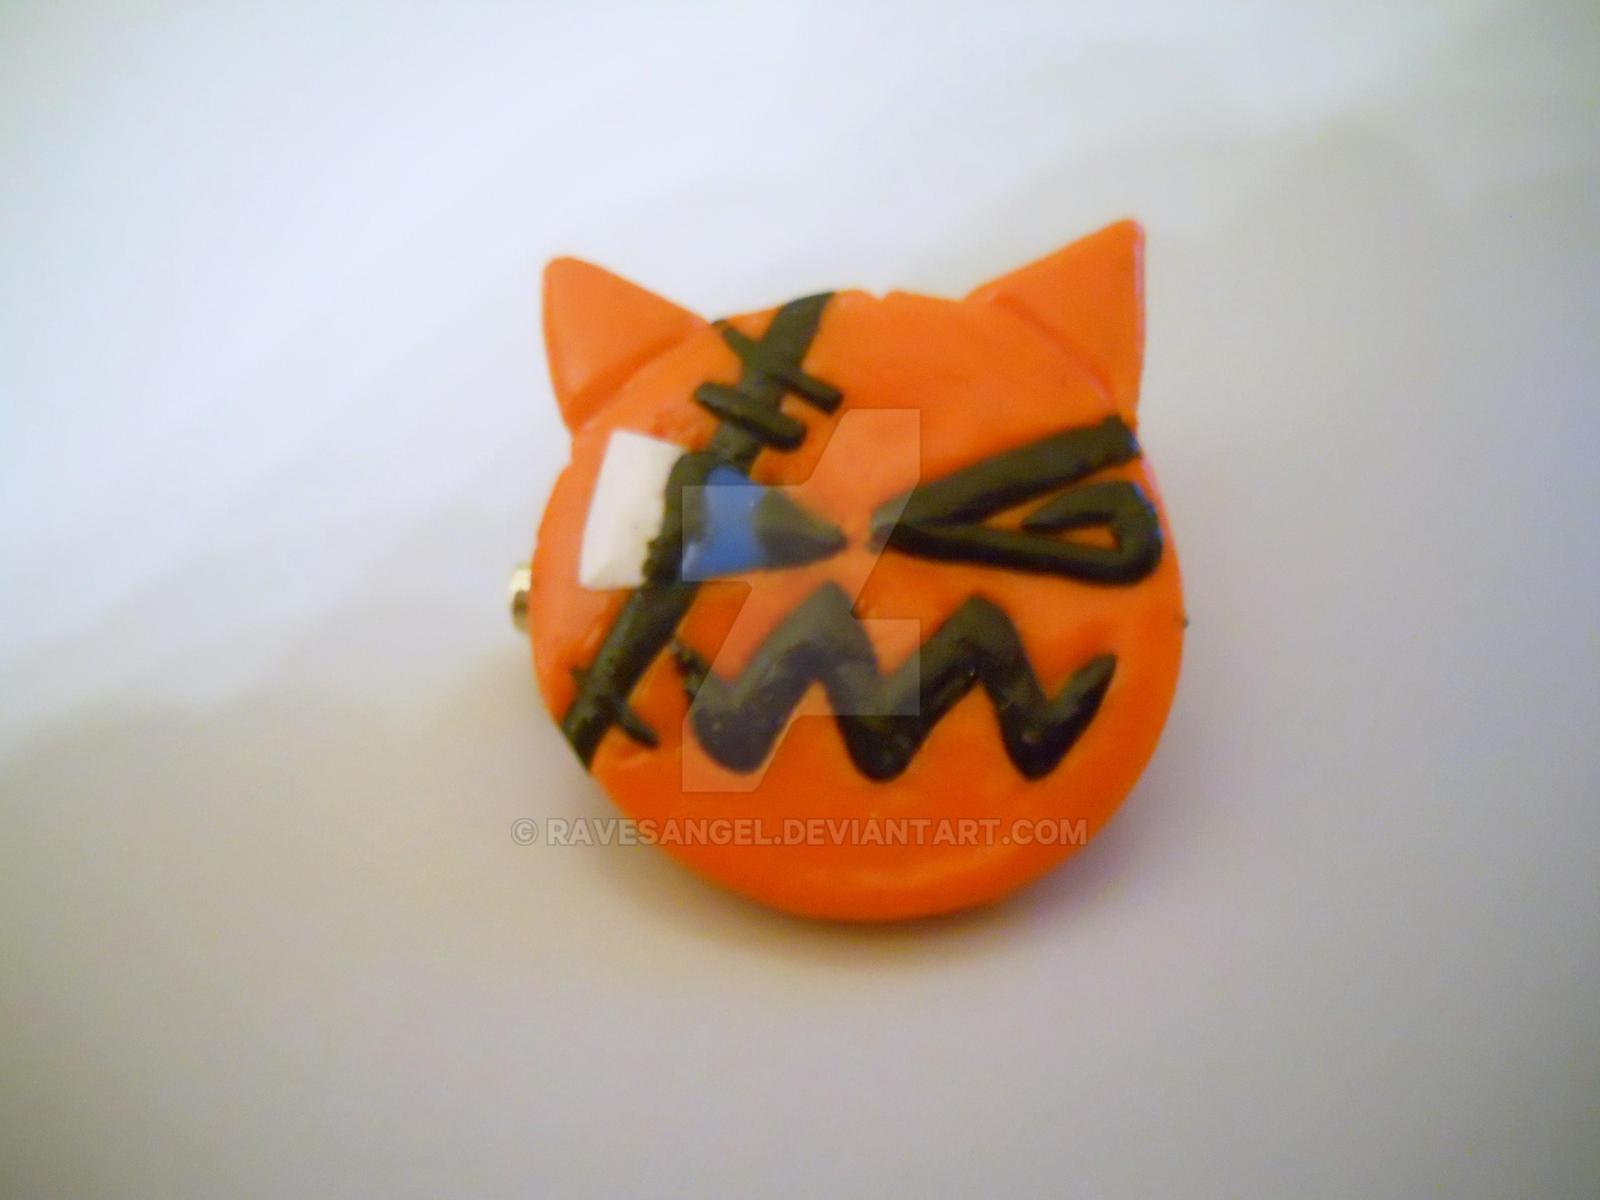 Halloween Town Sora's Mask Pin by RavesAngel on DeviantArt